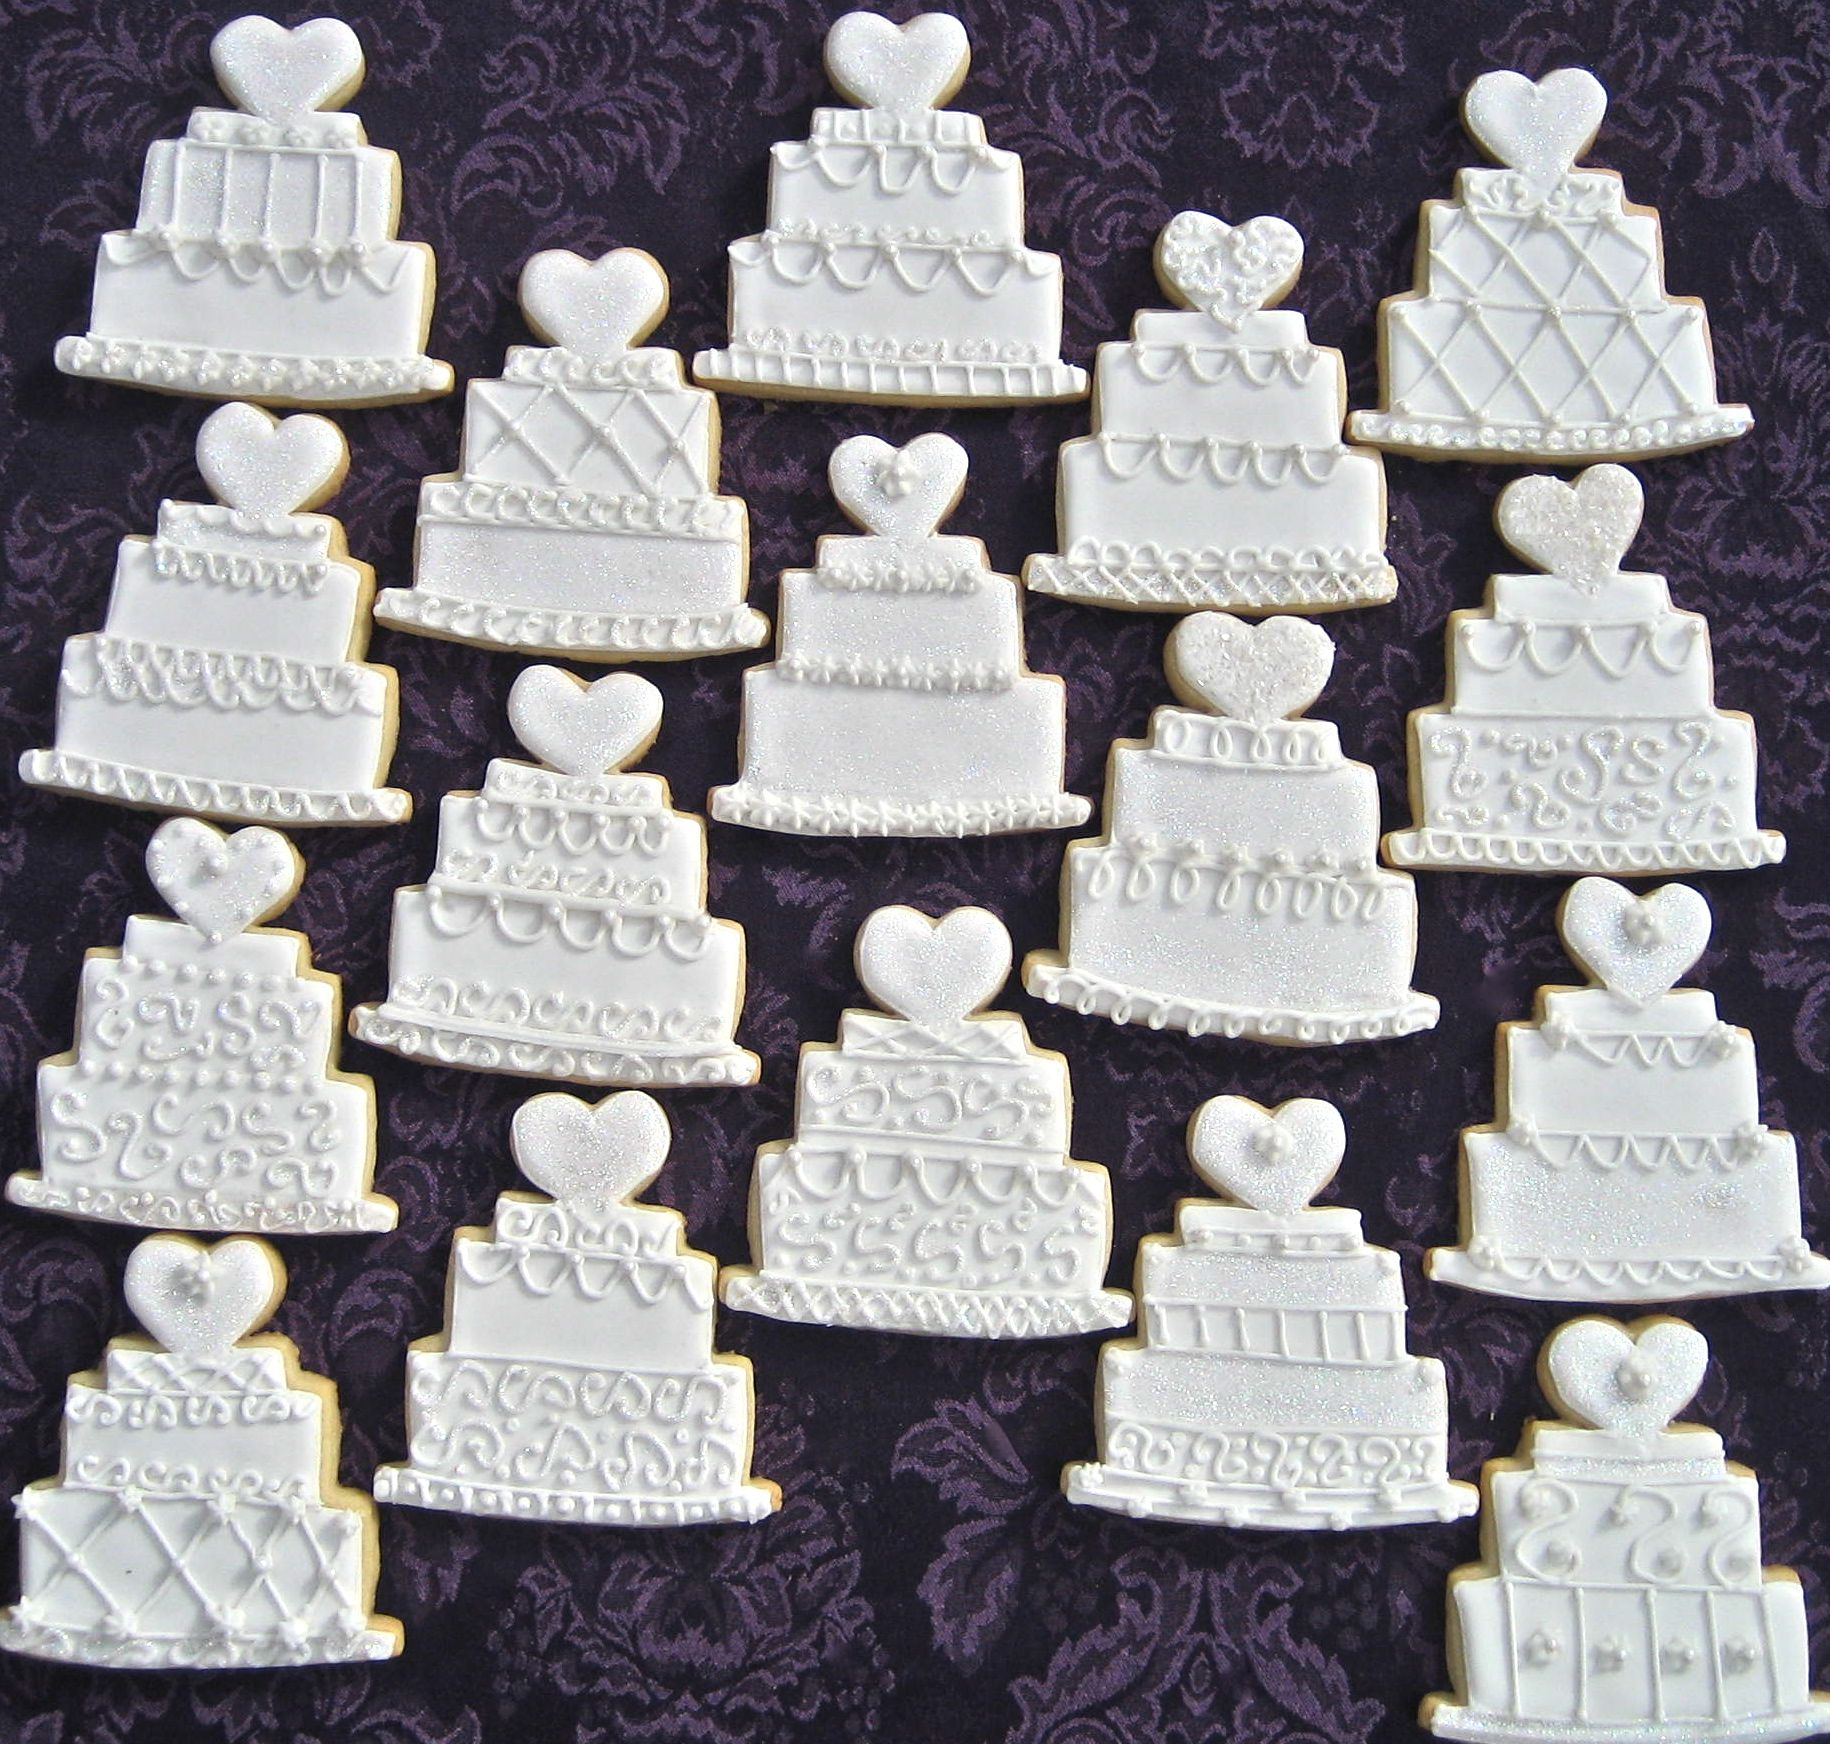 Big A Little A On WordPress Com Wedding Cake Cookies Bridal Cookies Wedding Cookies Decorated